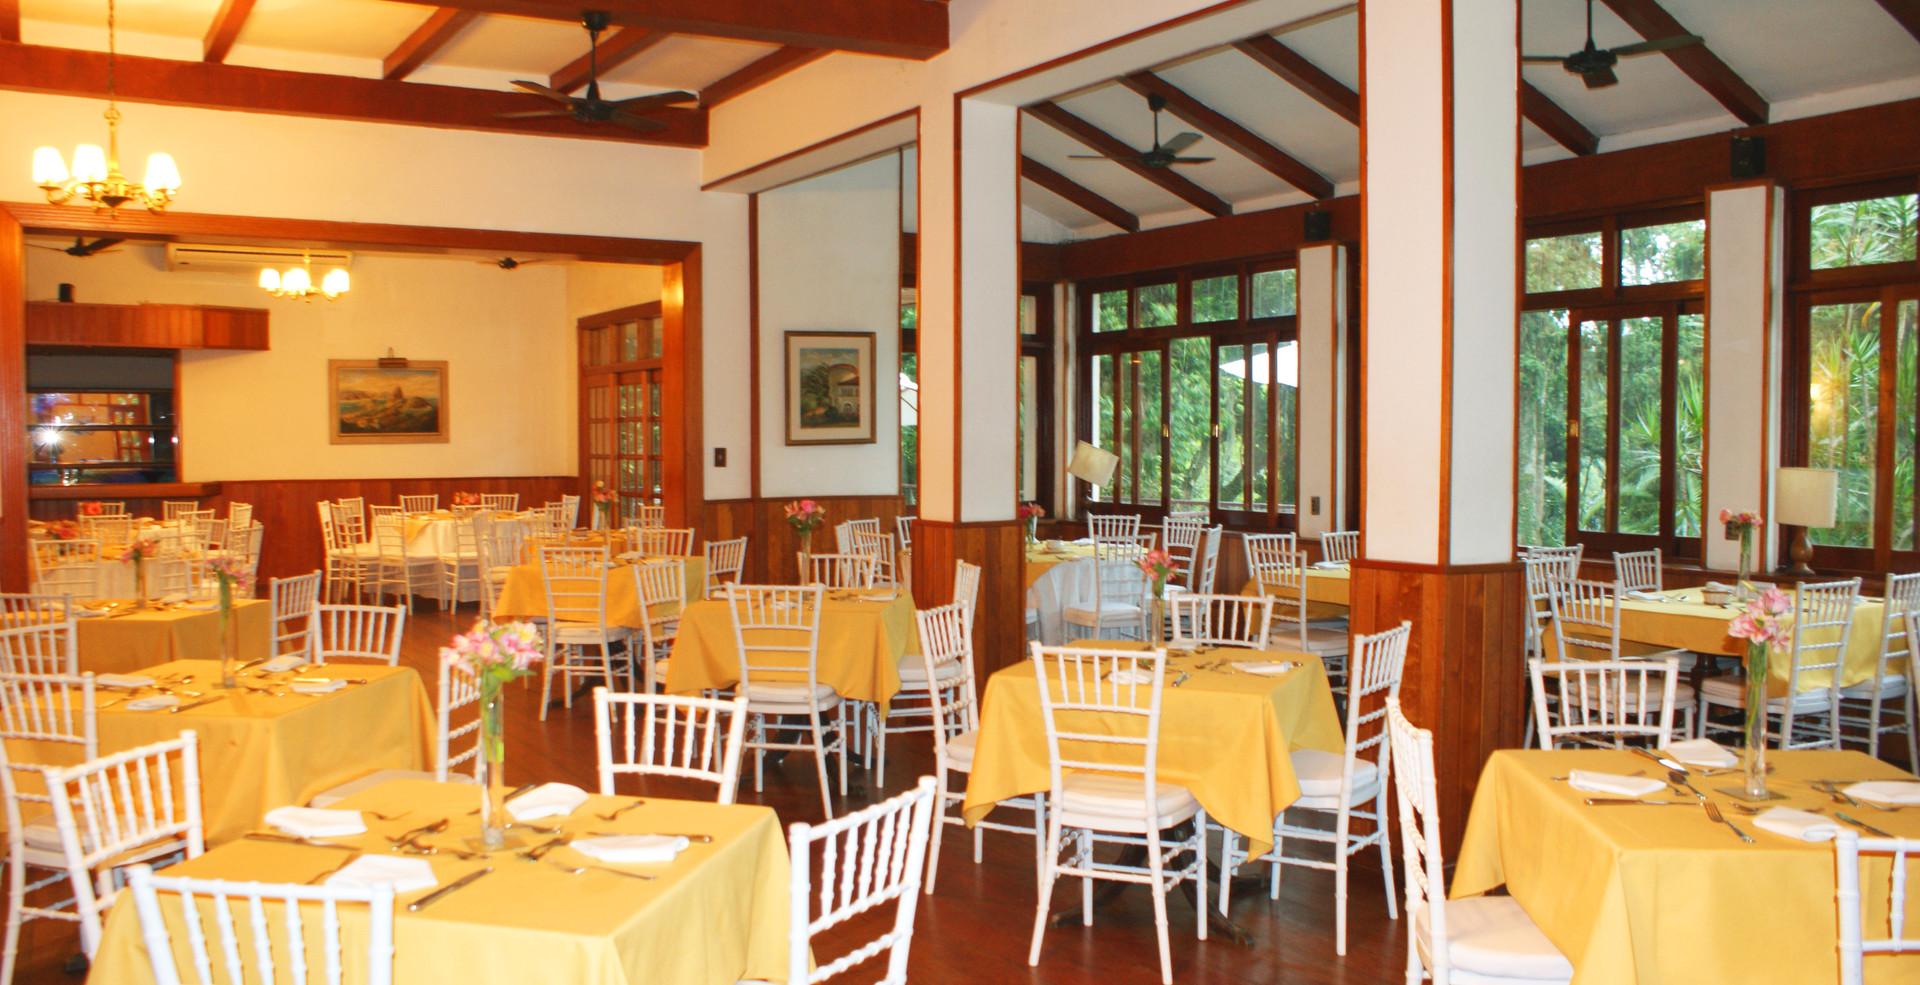 clube_sociedade_germania_restaurante04.j